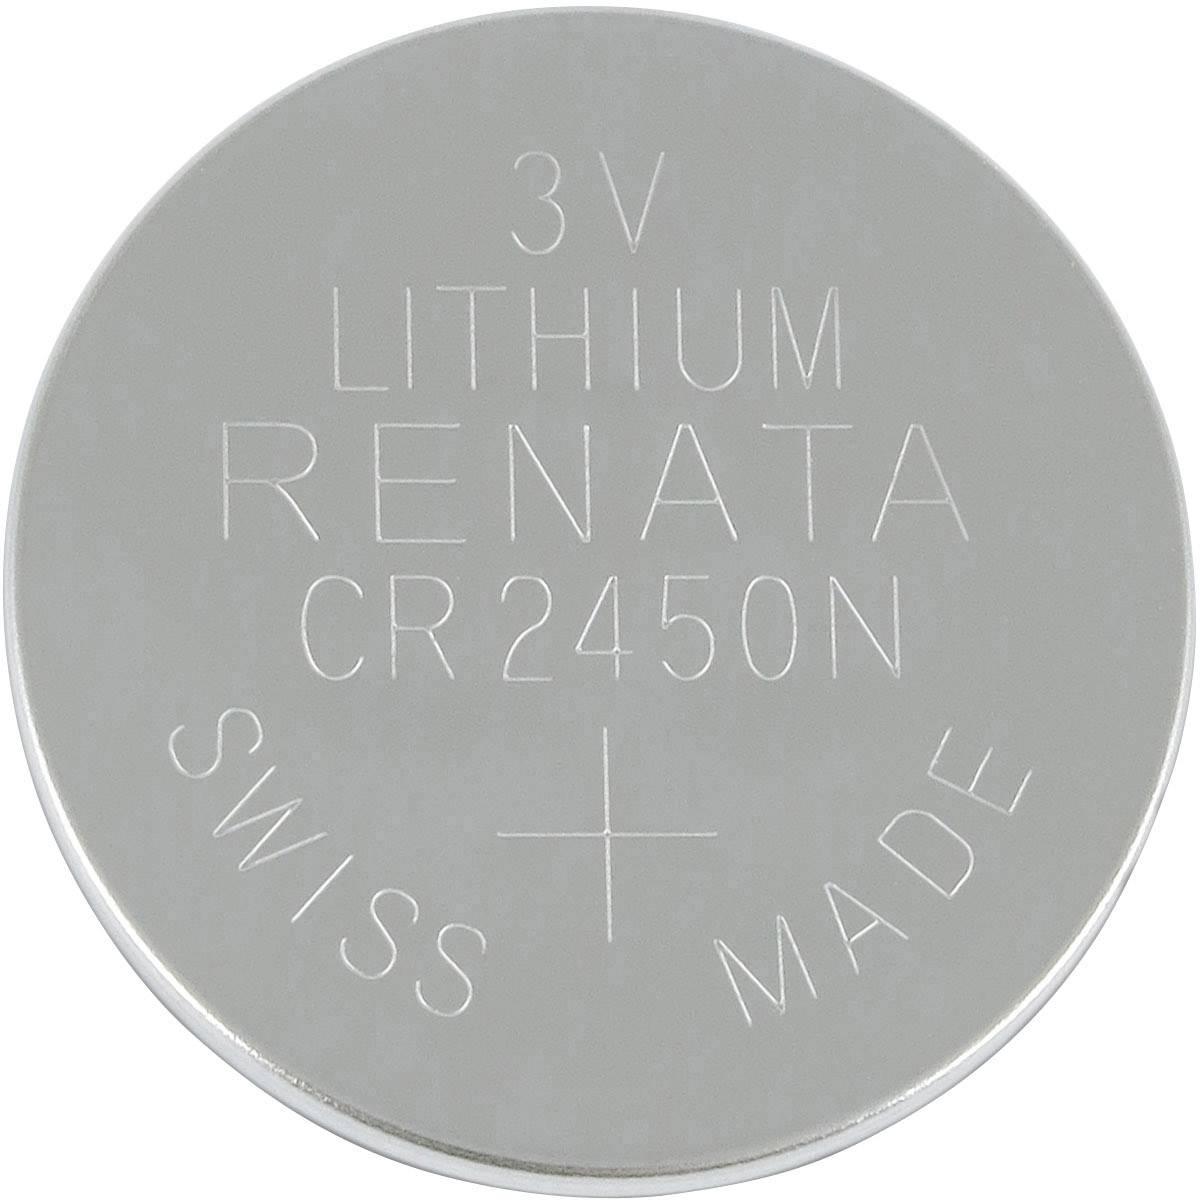 Gombíková batéria CR 2450N lítium Renata, 540 mAh, 3 V